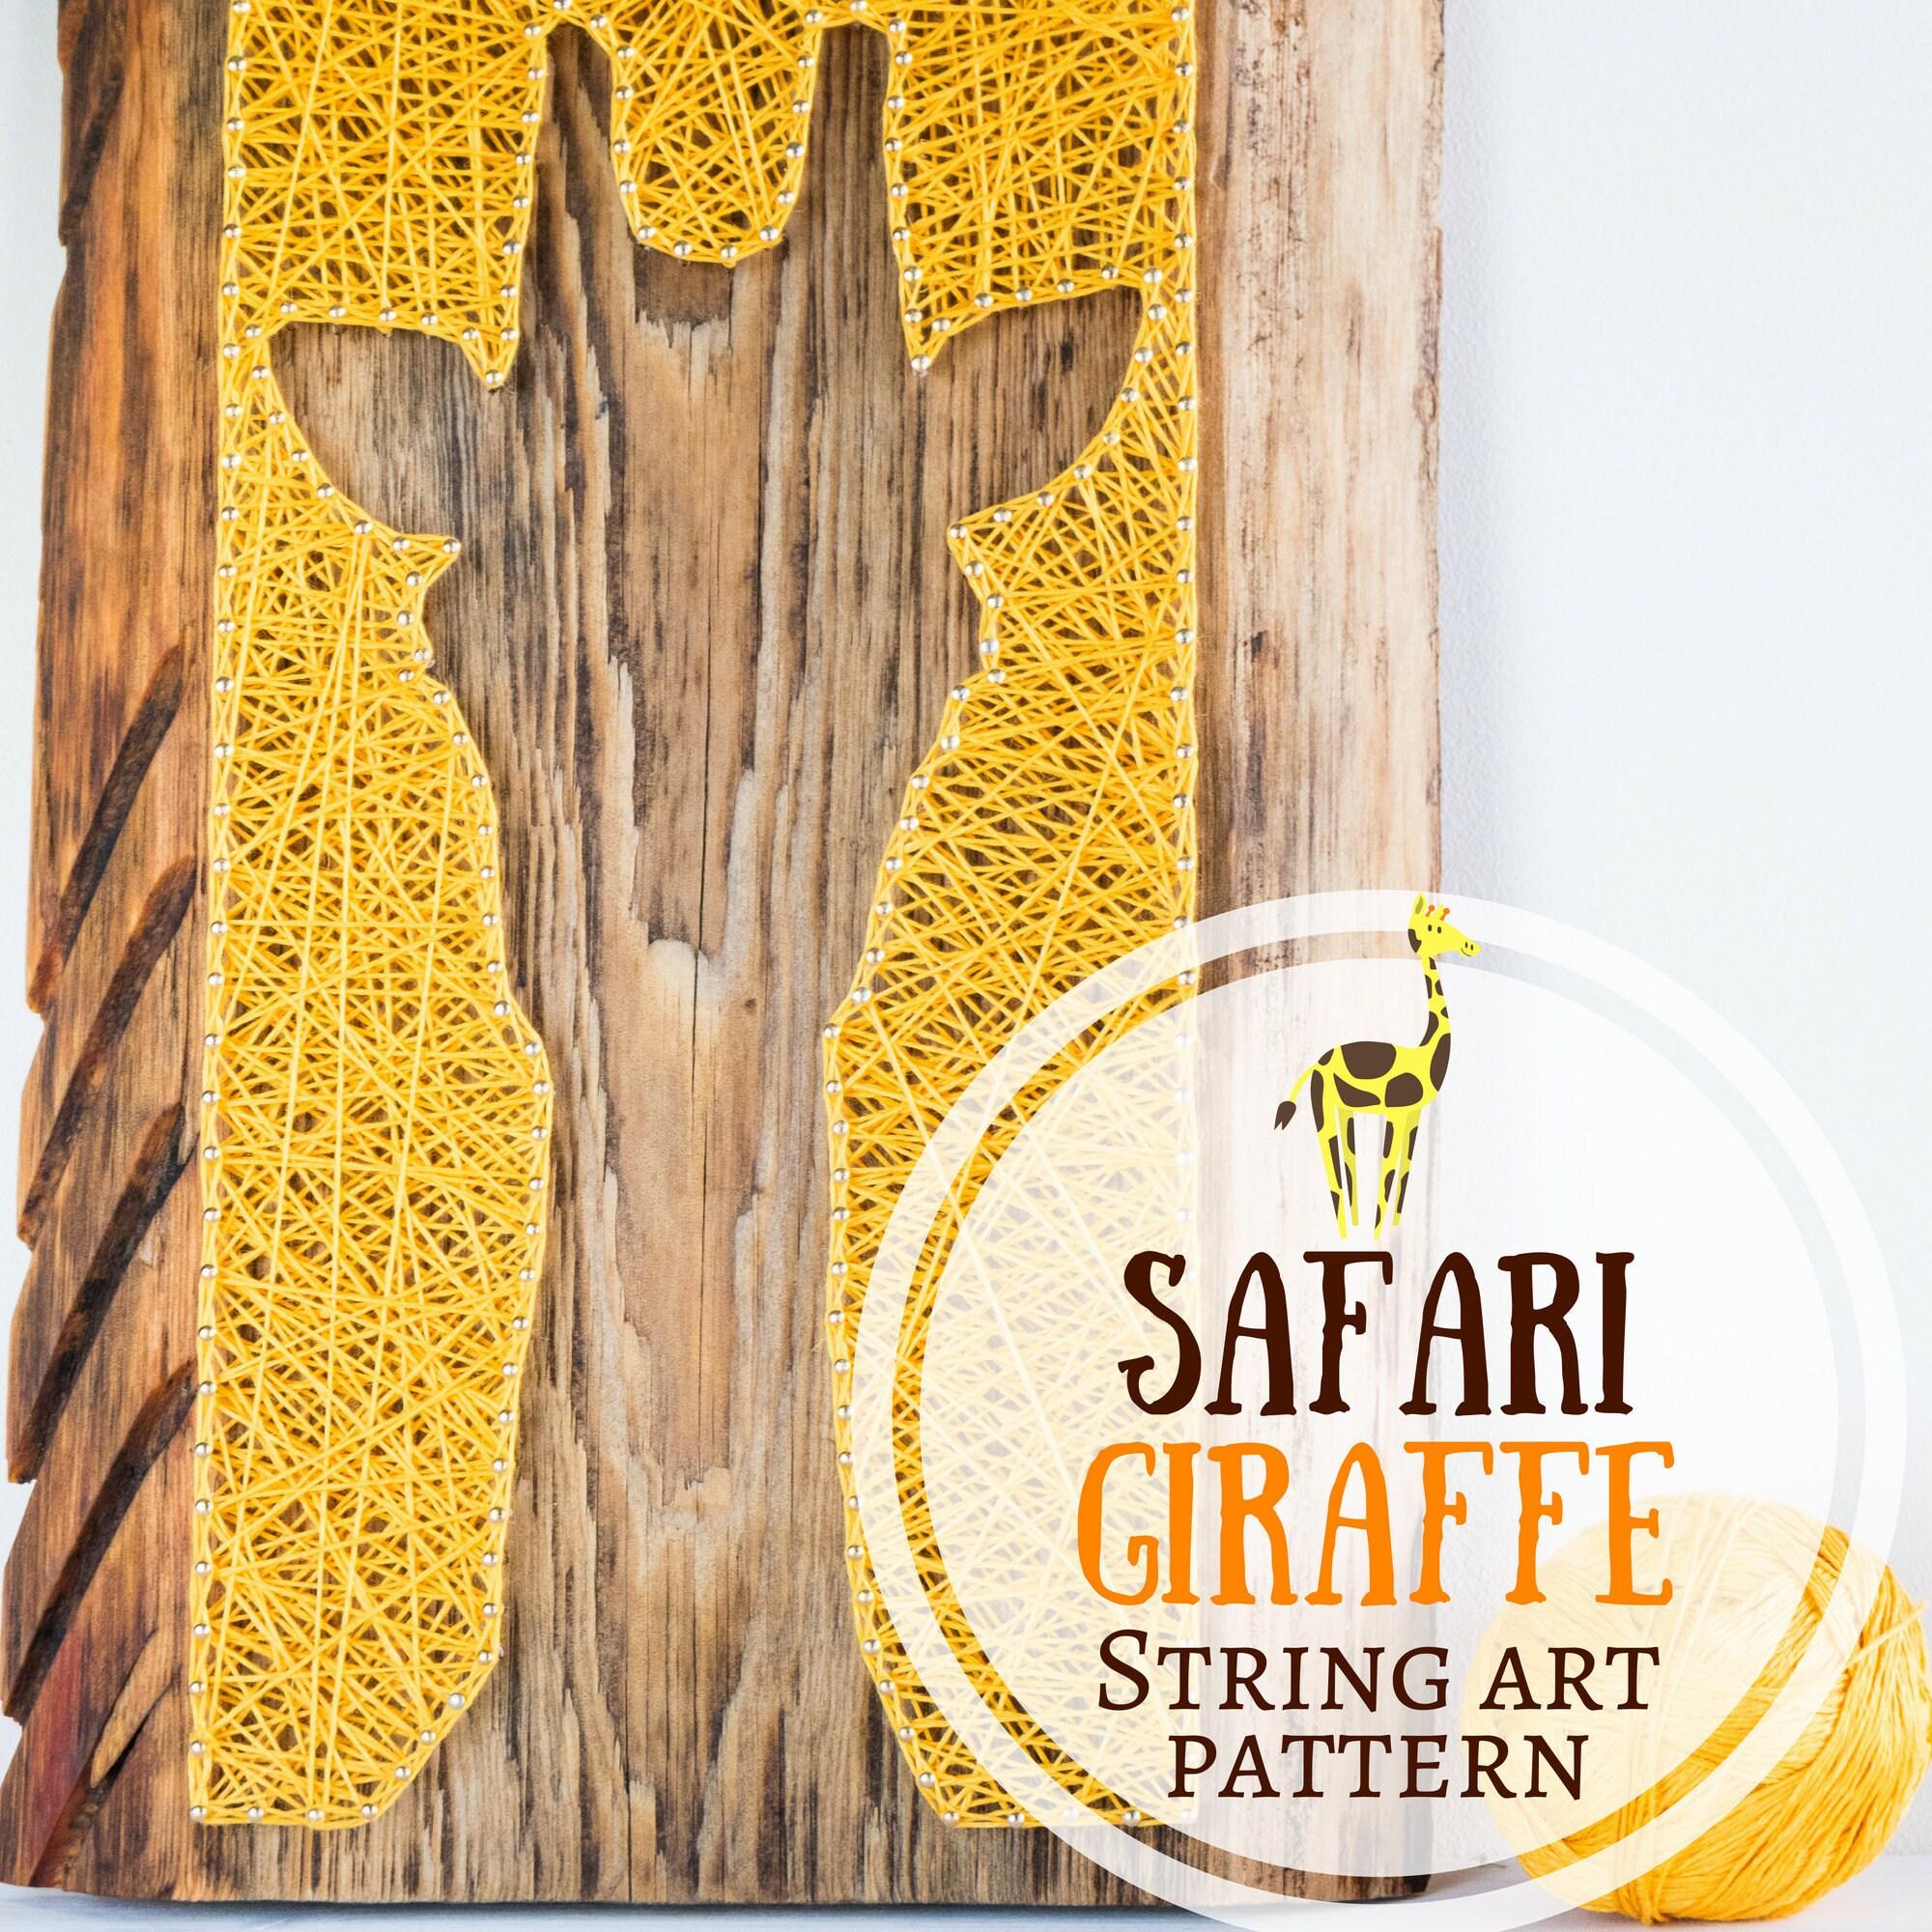 Modern safari giraffe silhouette minimalist string art pattern, DIY ...